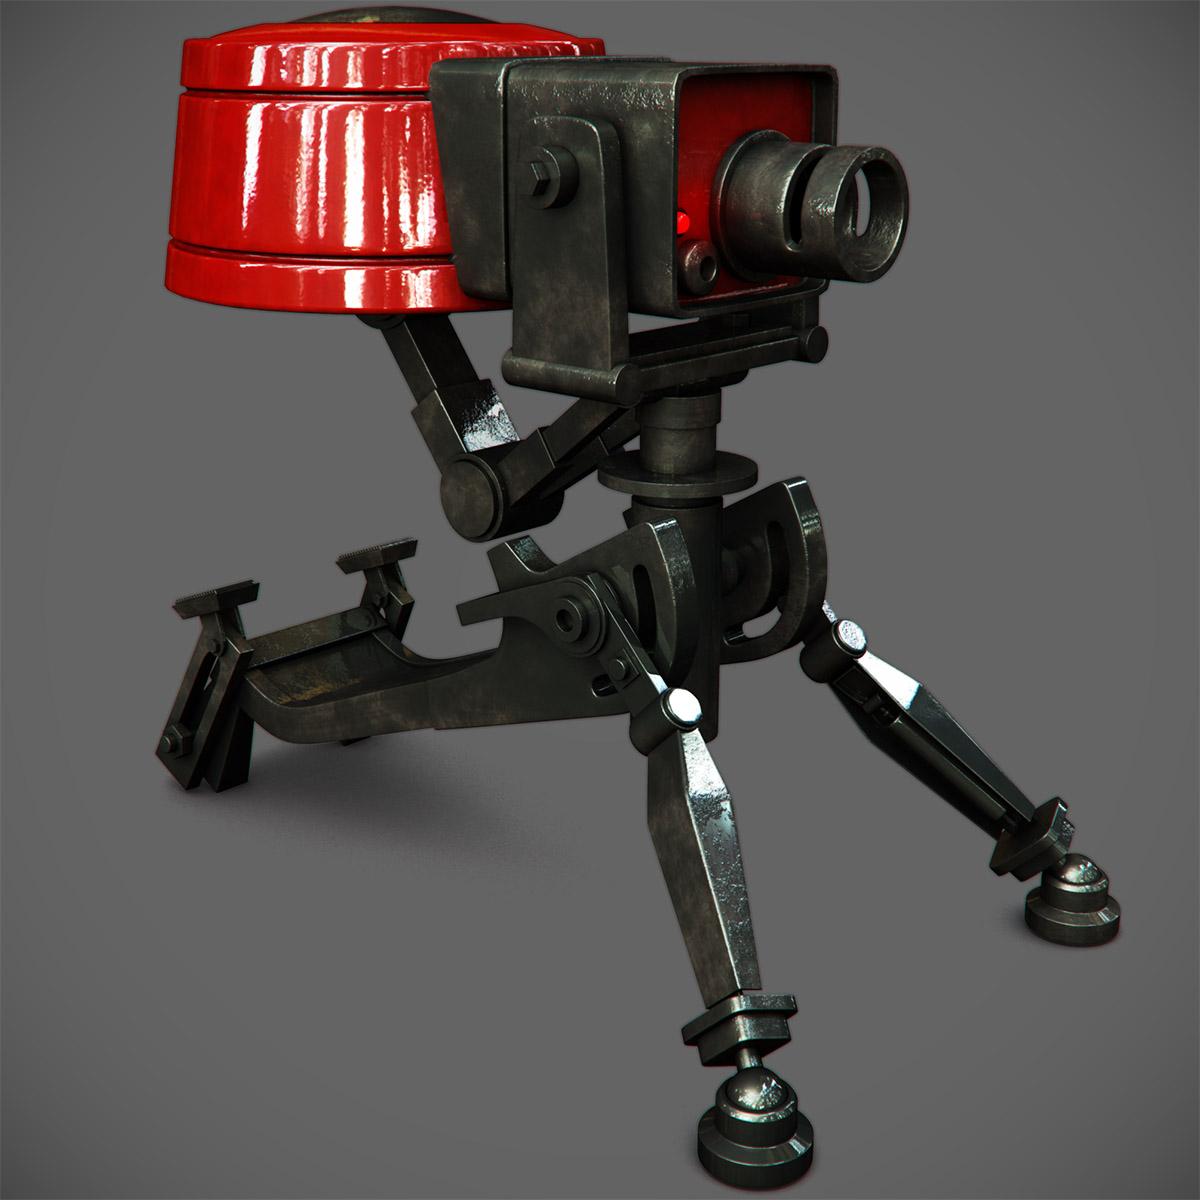 Team Fortress 2 Sentry by cbinder on DeviantArt